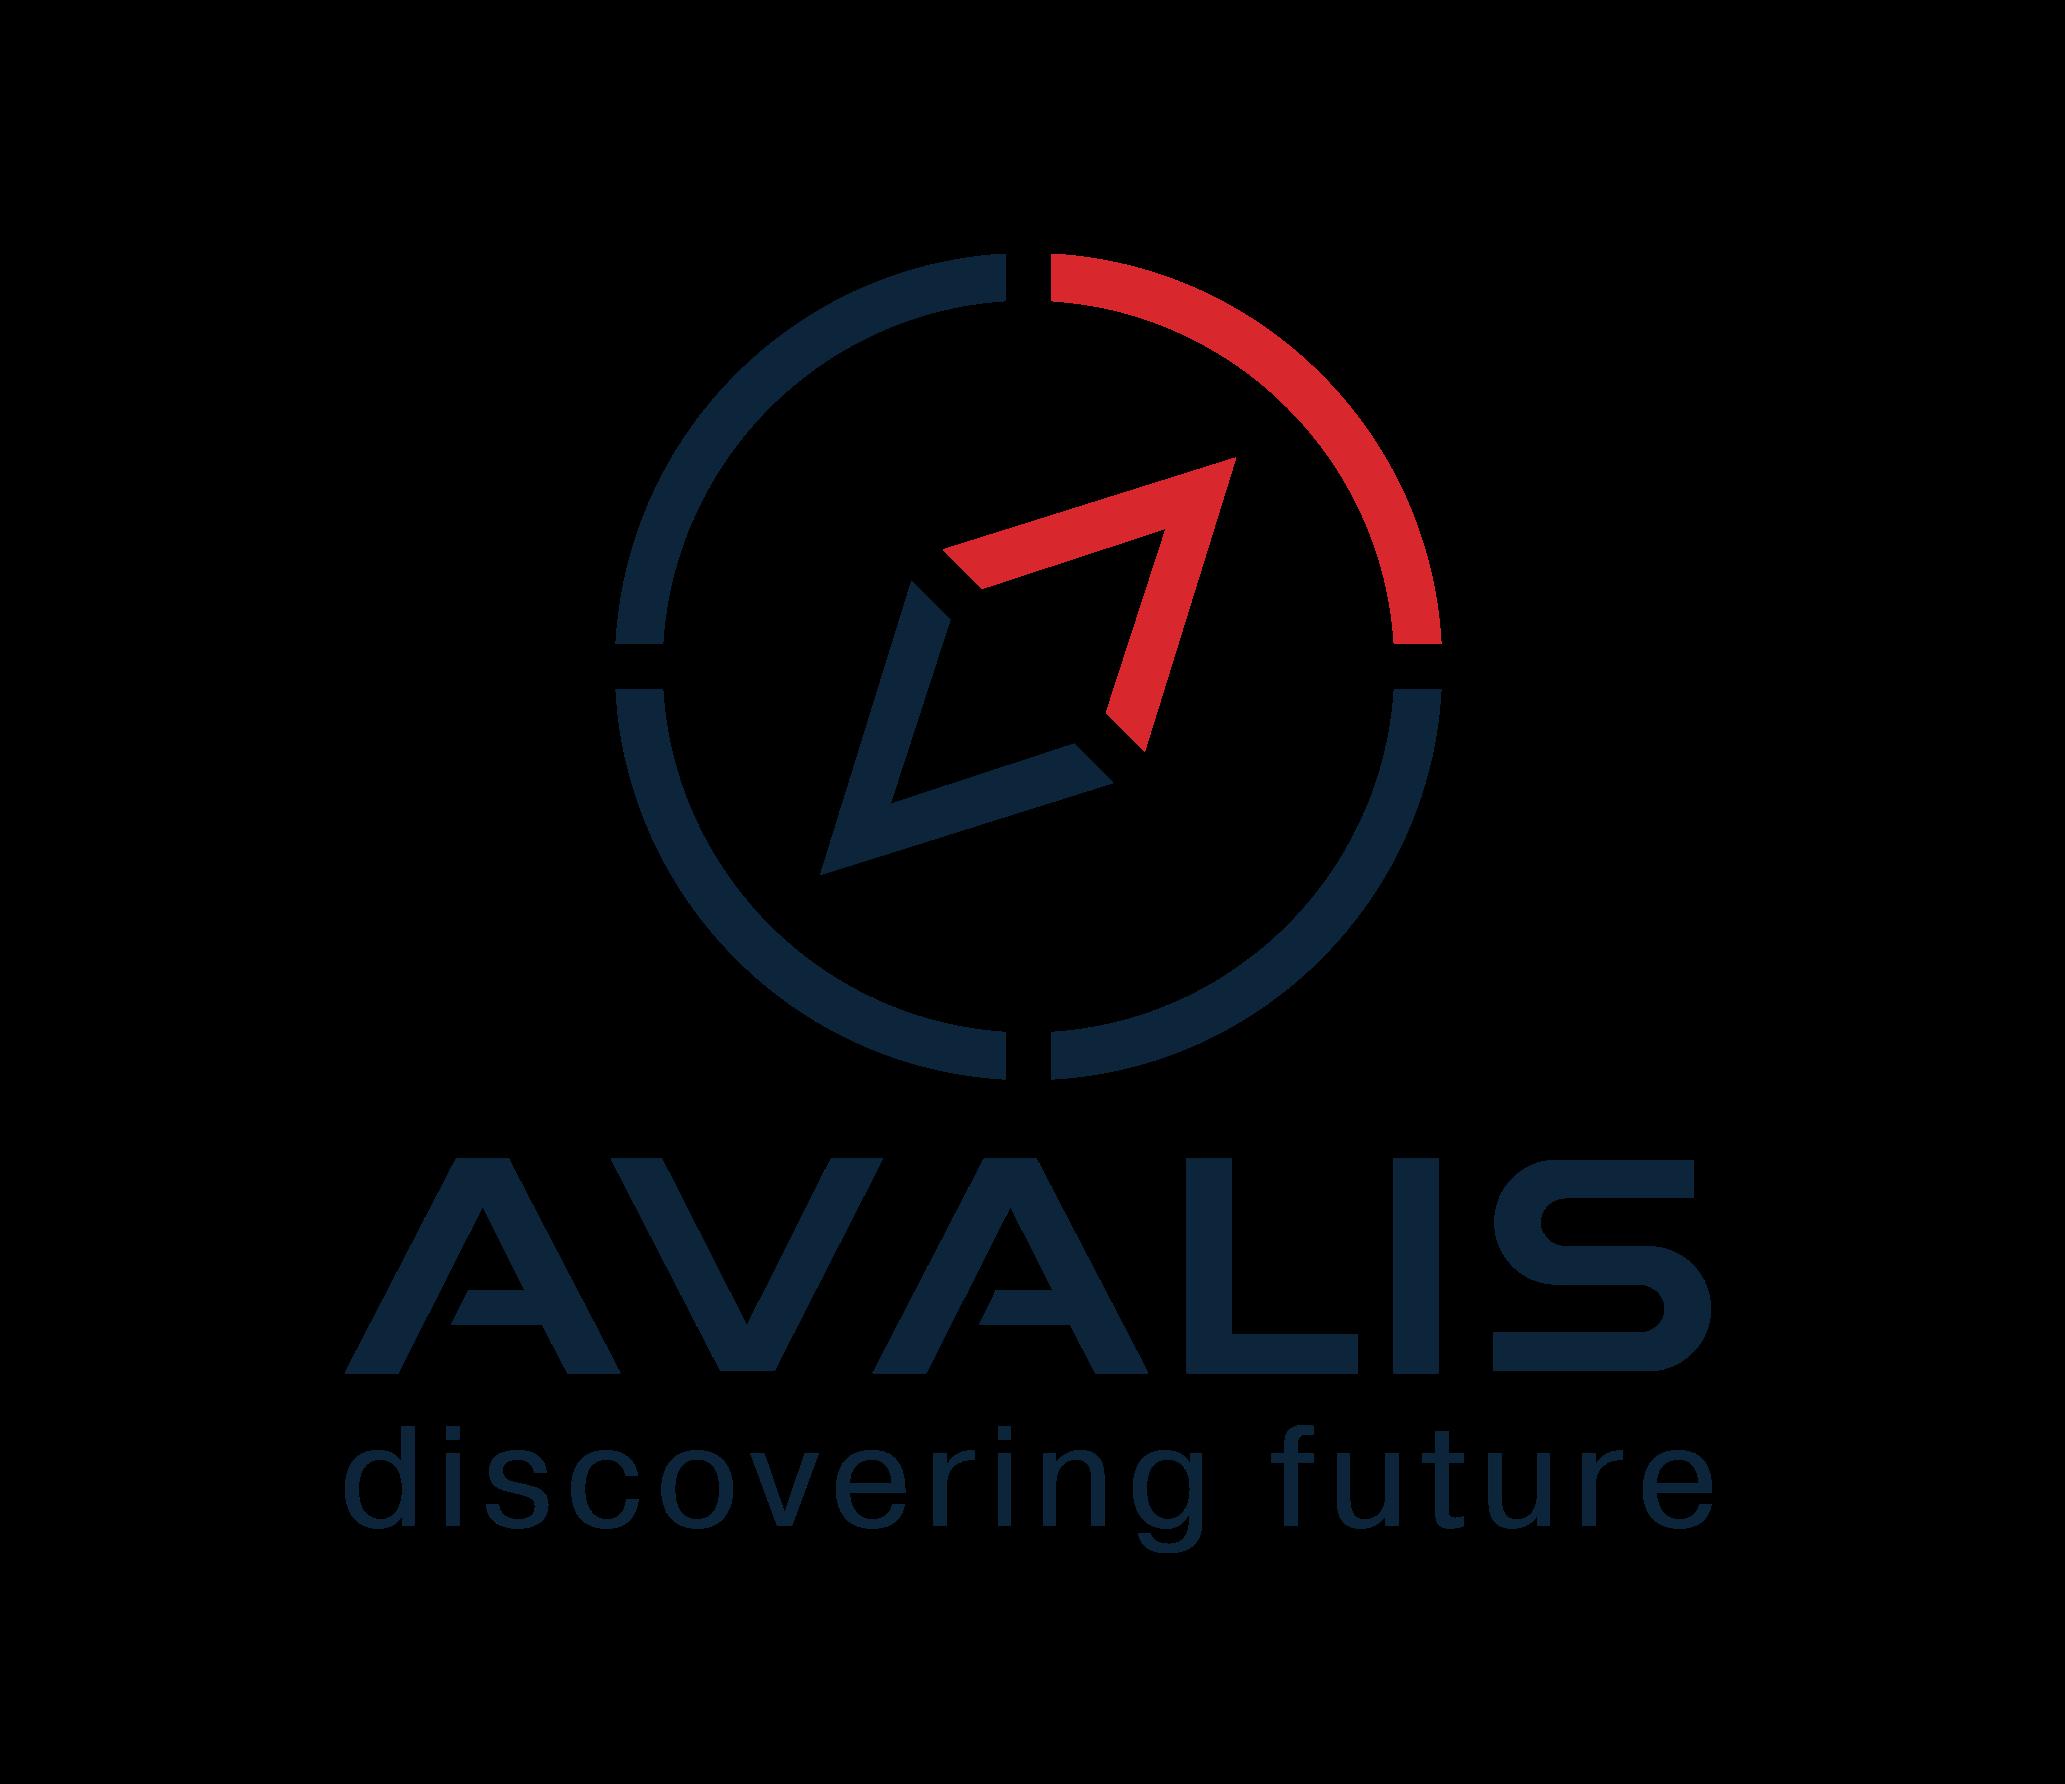 Avalis logo